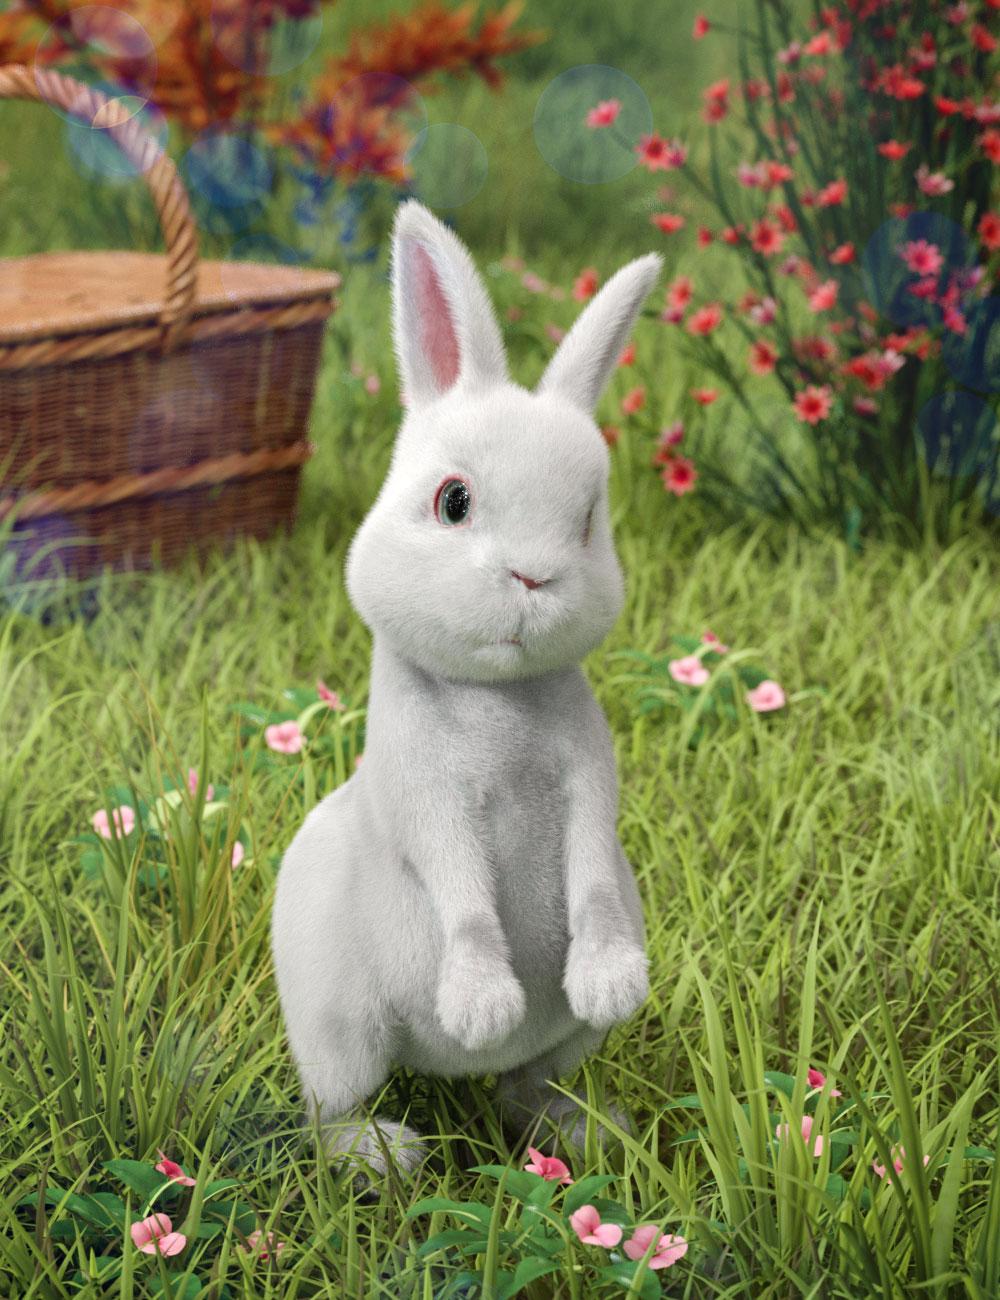 Pufflet The Bunny by: Hypertaf, 3D Models by Daz 3D